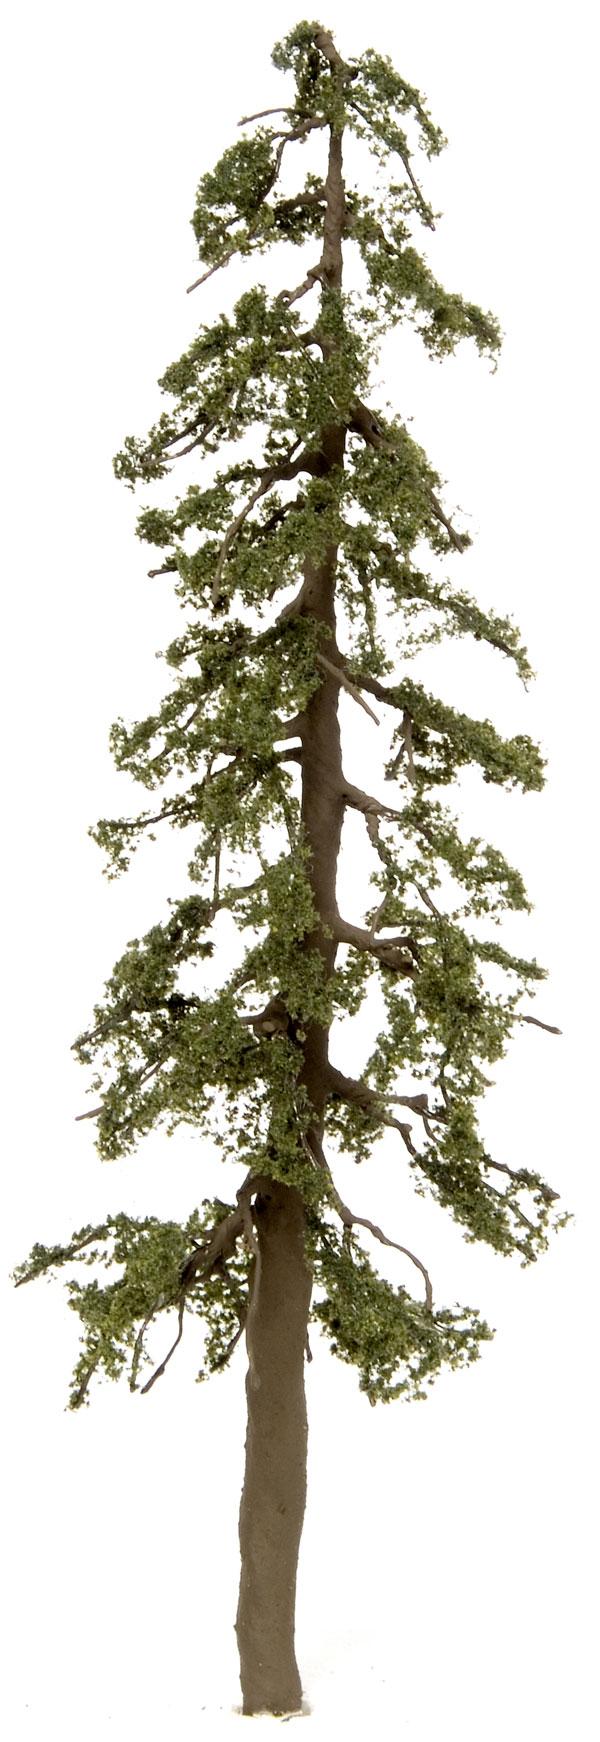 Pine Tree clipart redwood Clip Cliparts redwood Redwood Download